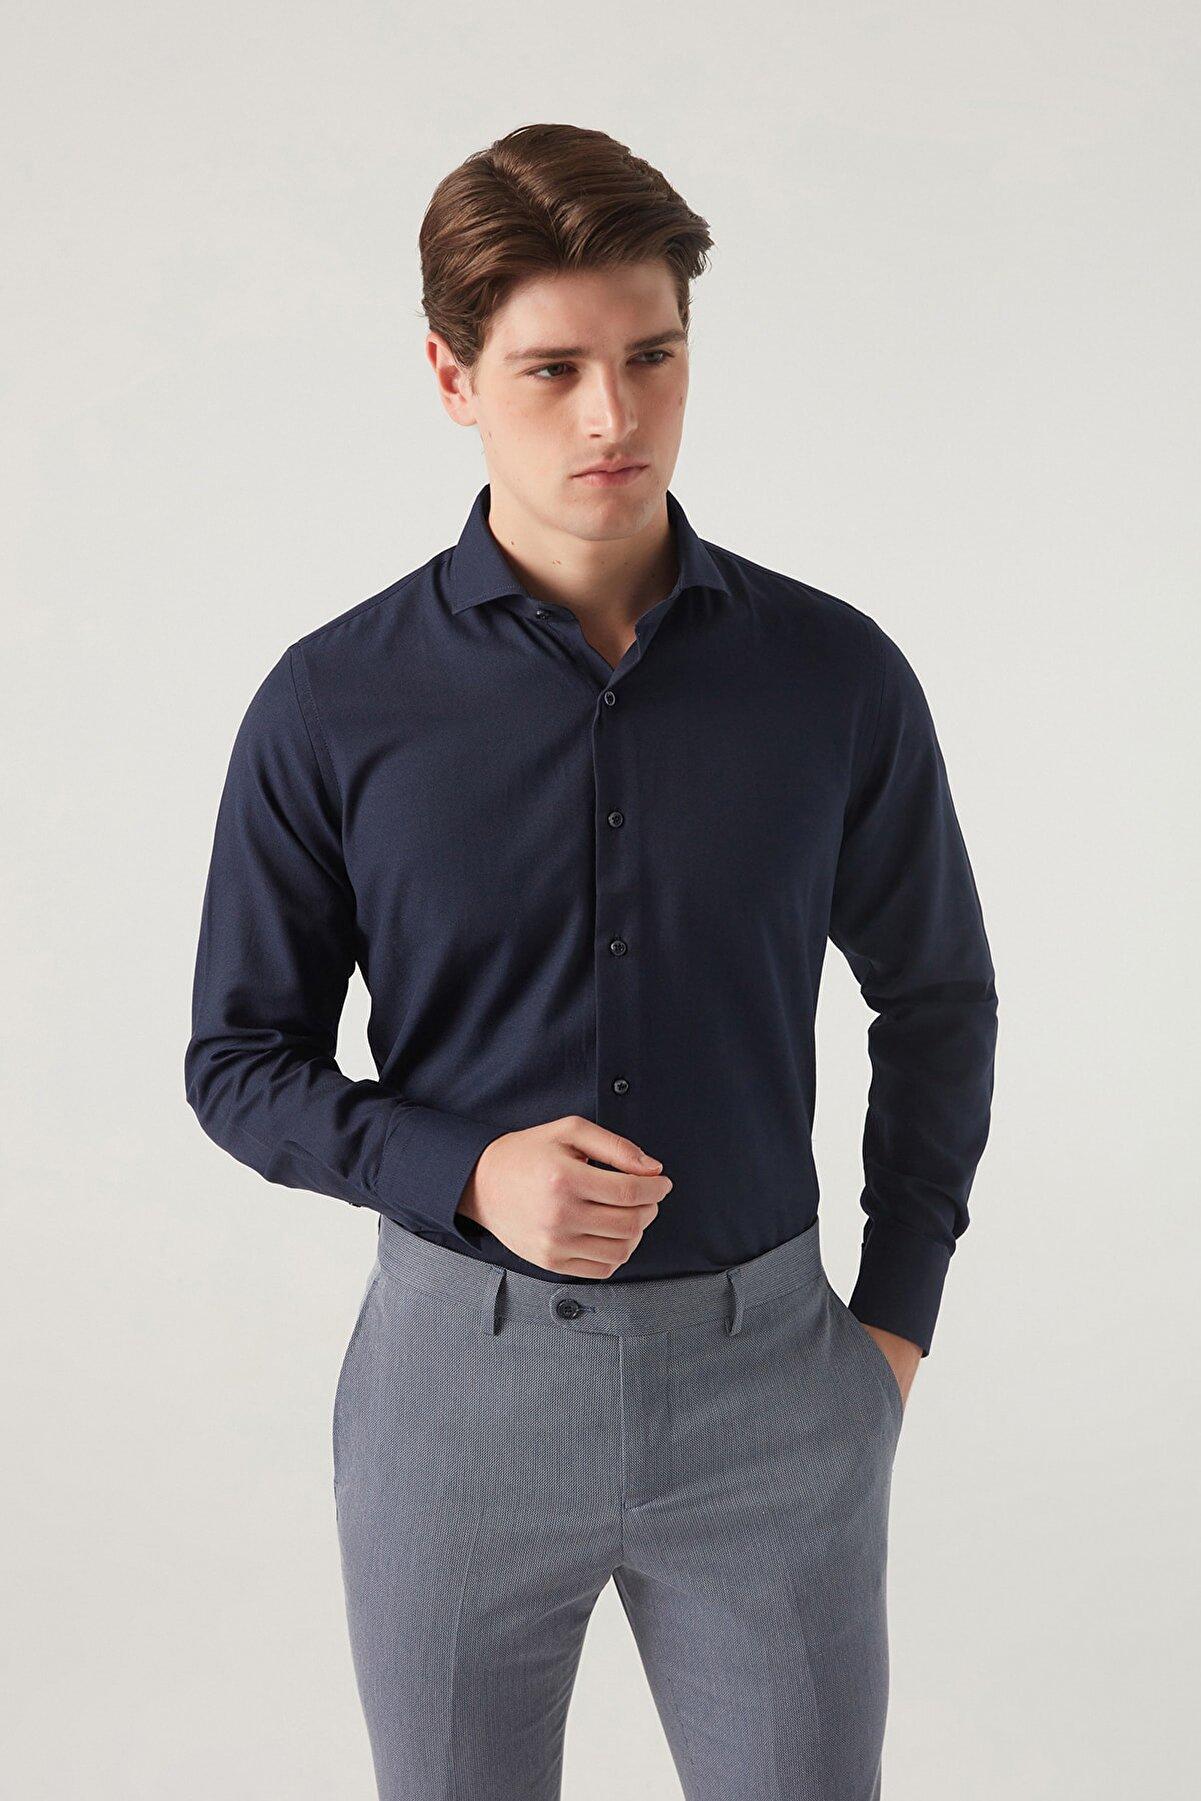 D'S Damat Slim Fit Lacivert Renk Erkek Gömlek